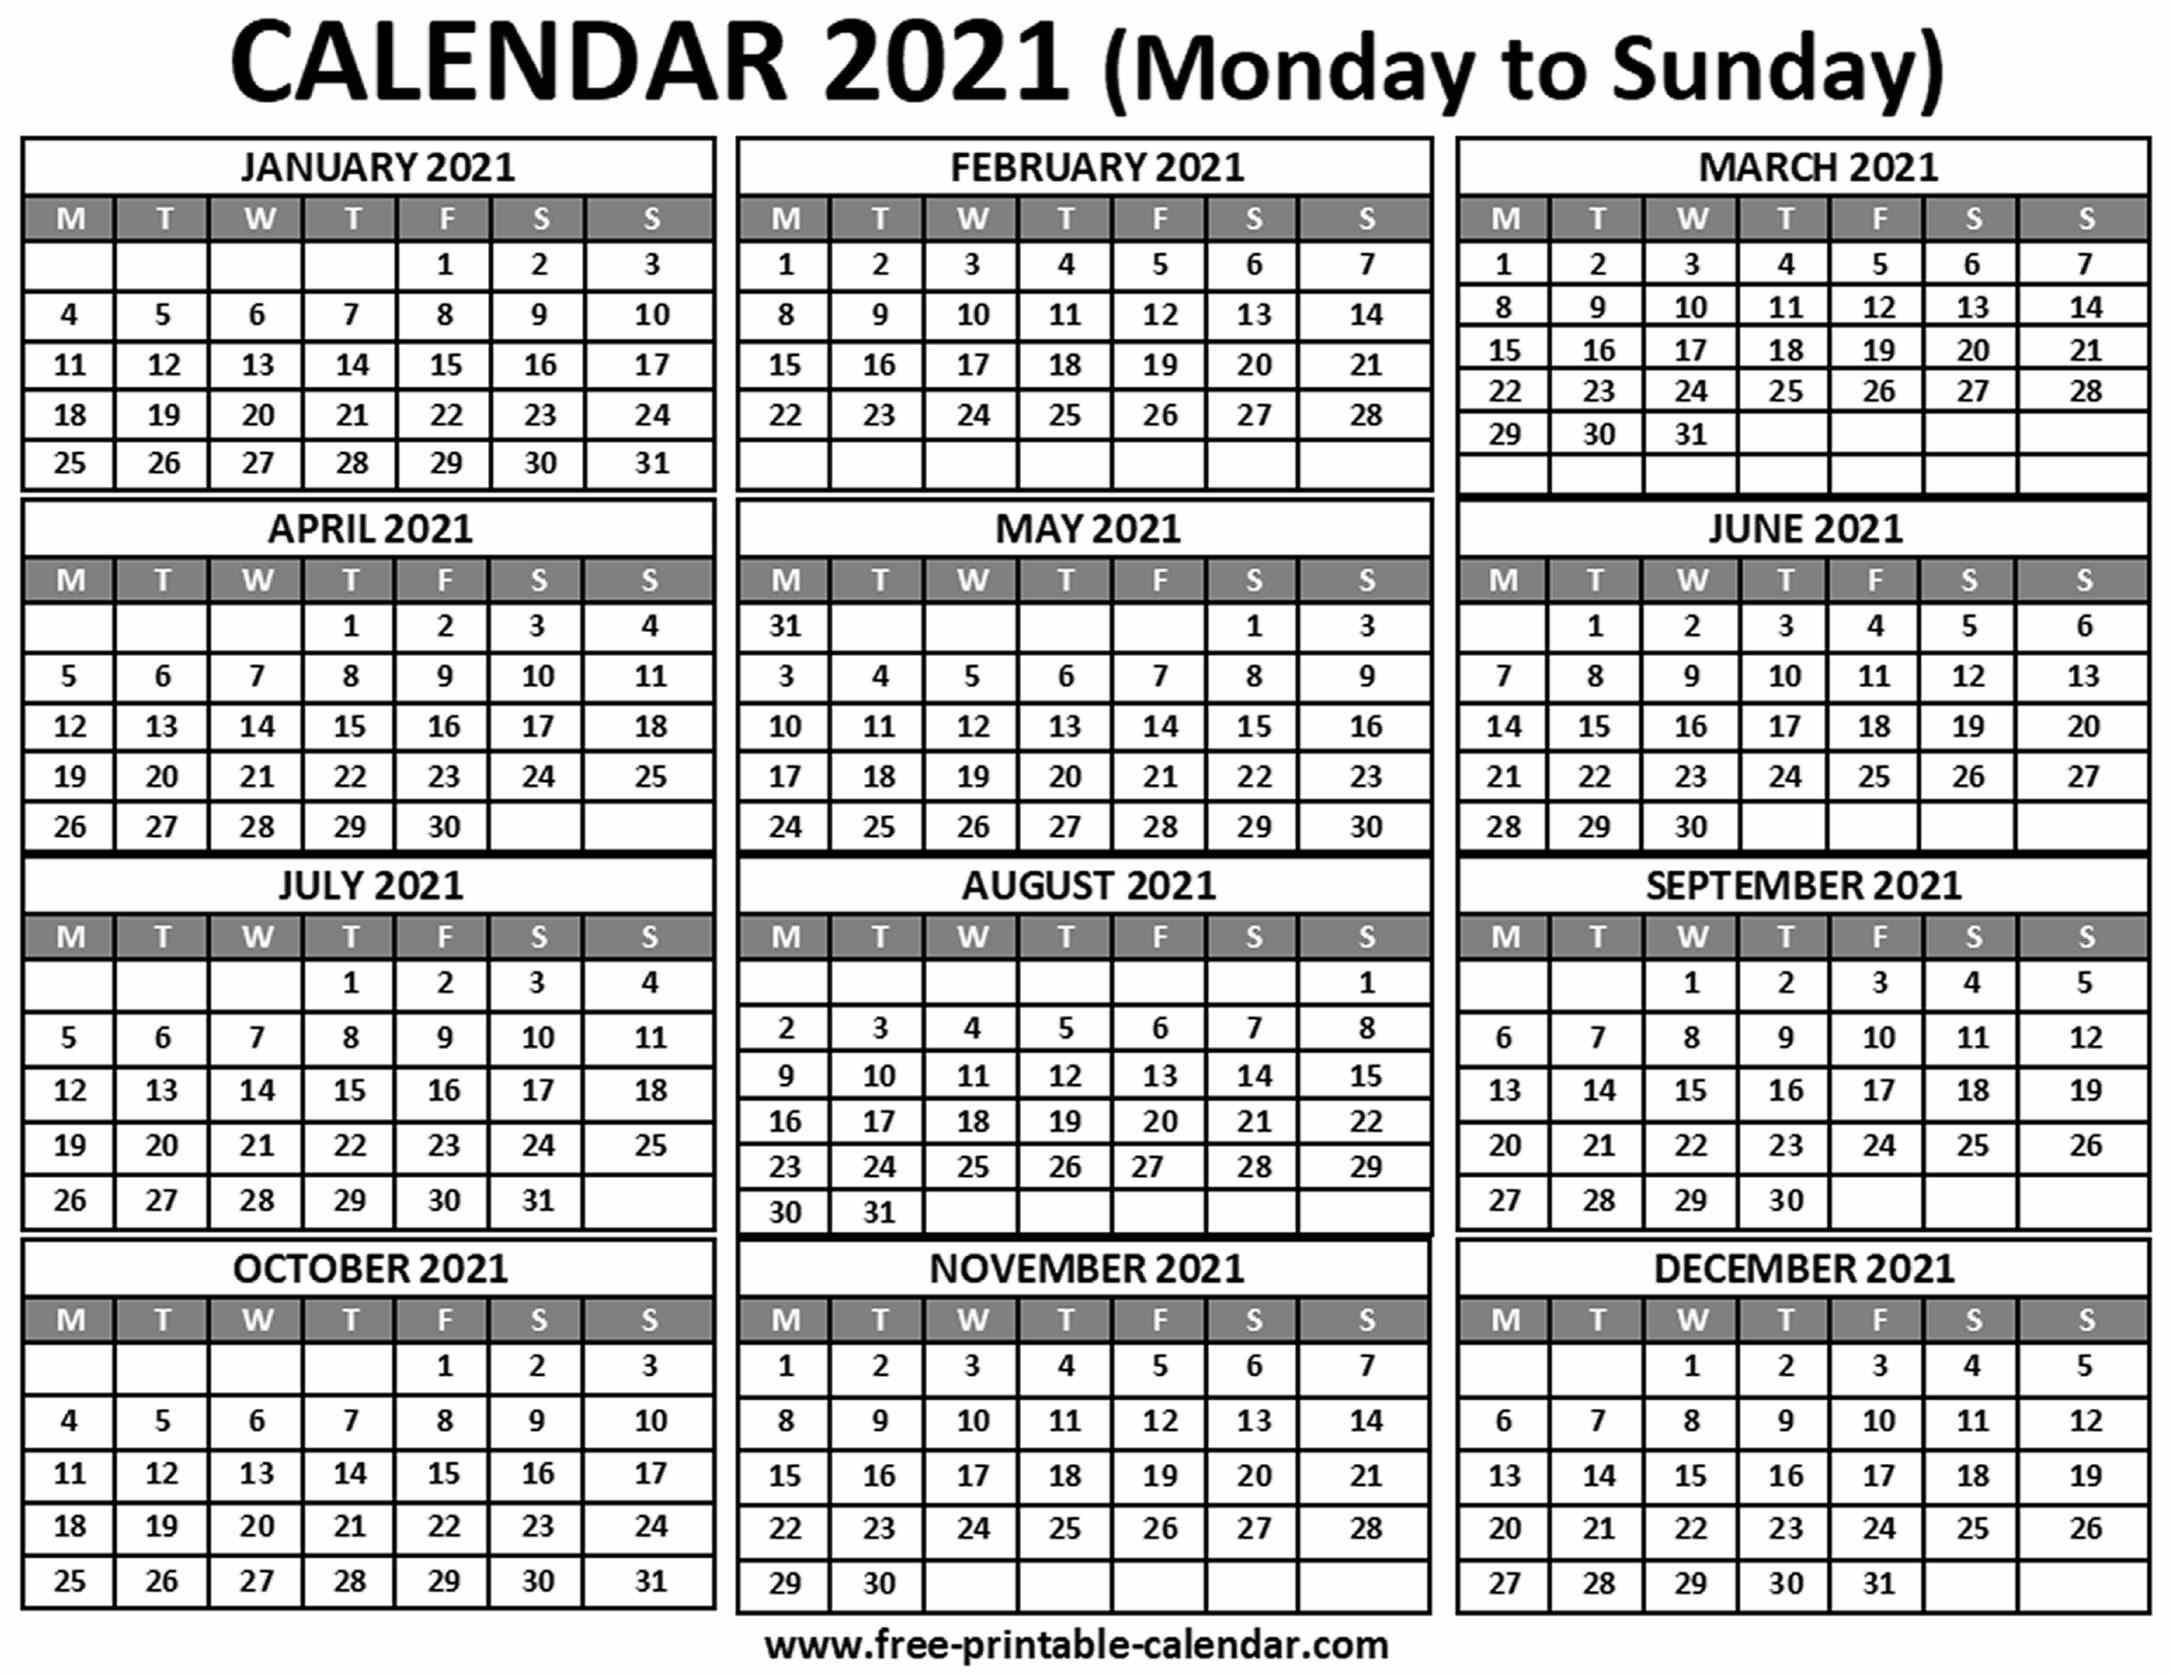 2021 Calendar - Free-Printable-Calendar inside 2021 Printable Pocket Calendars